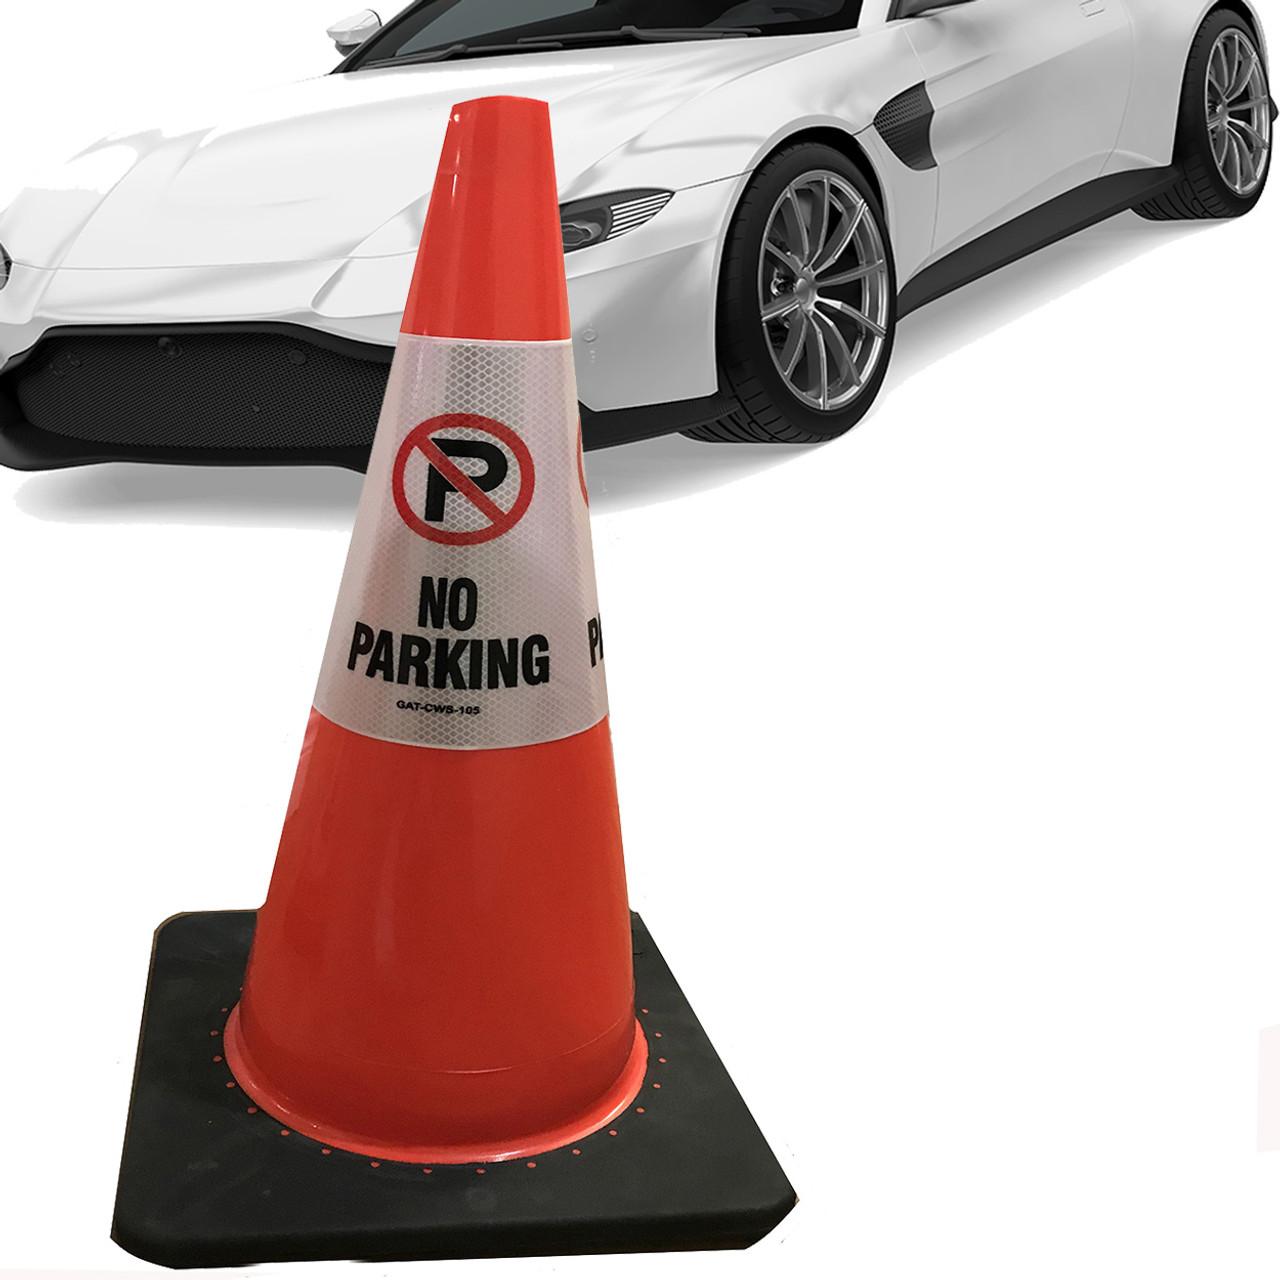 No parking Safety Cone Collar - Reflective-6